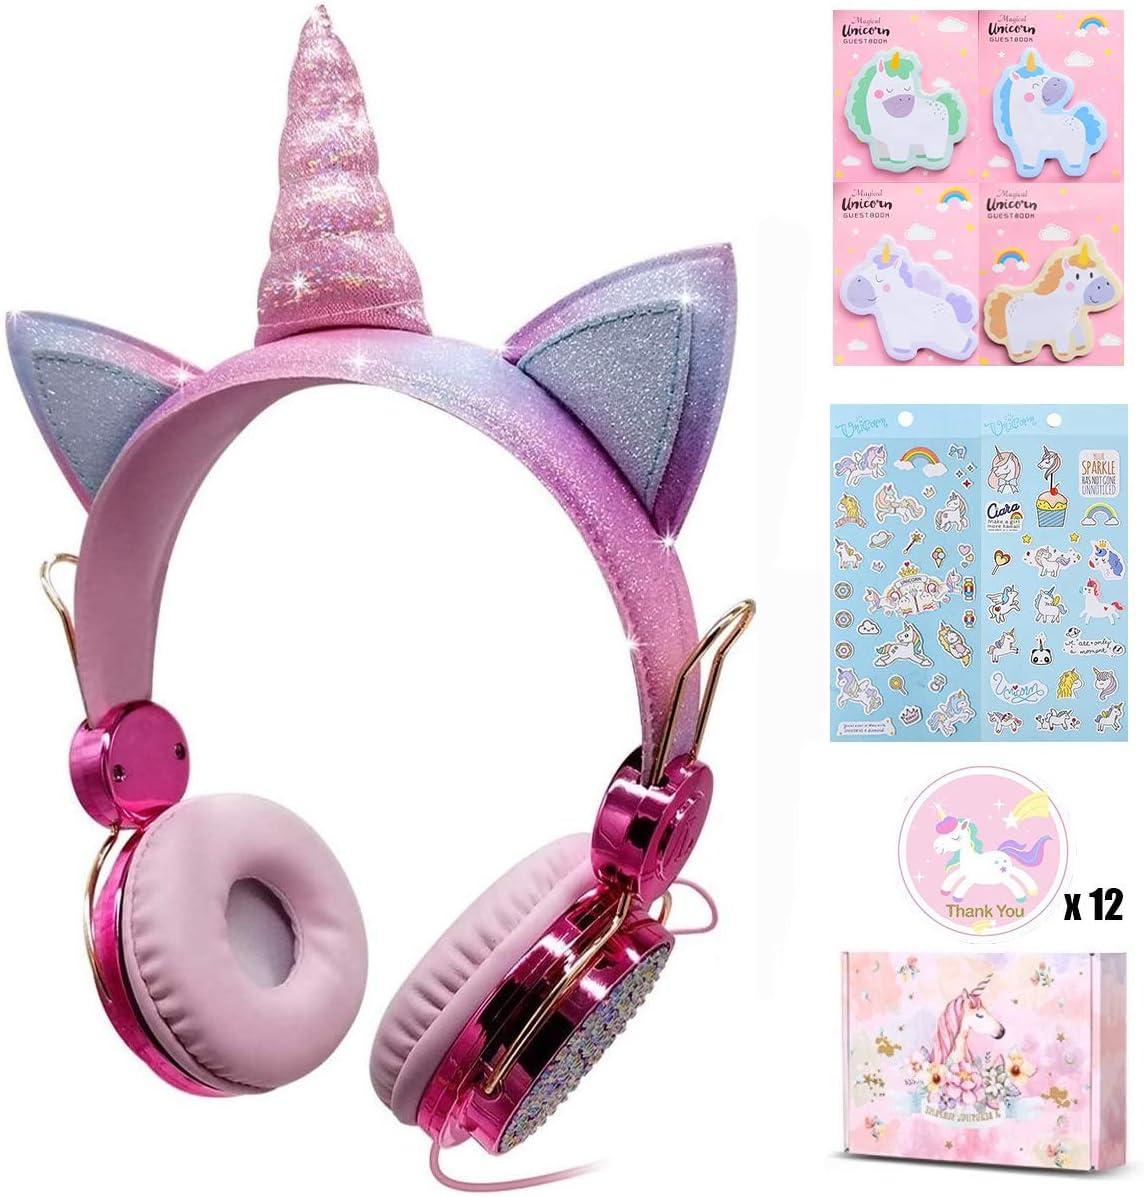 Unicorn Kids Headphones for Girls Children Teens, Wired Headphones for Kids with Adjustable Headband, 3.5mm Jack and Tangle-Free Cord, Over On Ear Headset w Mic for School Birthday Xmas Unicorn Rose